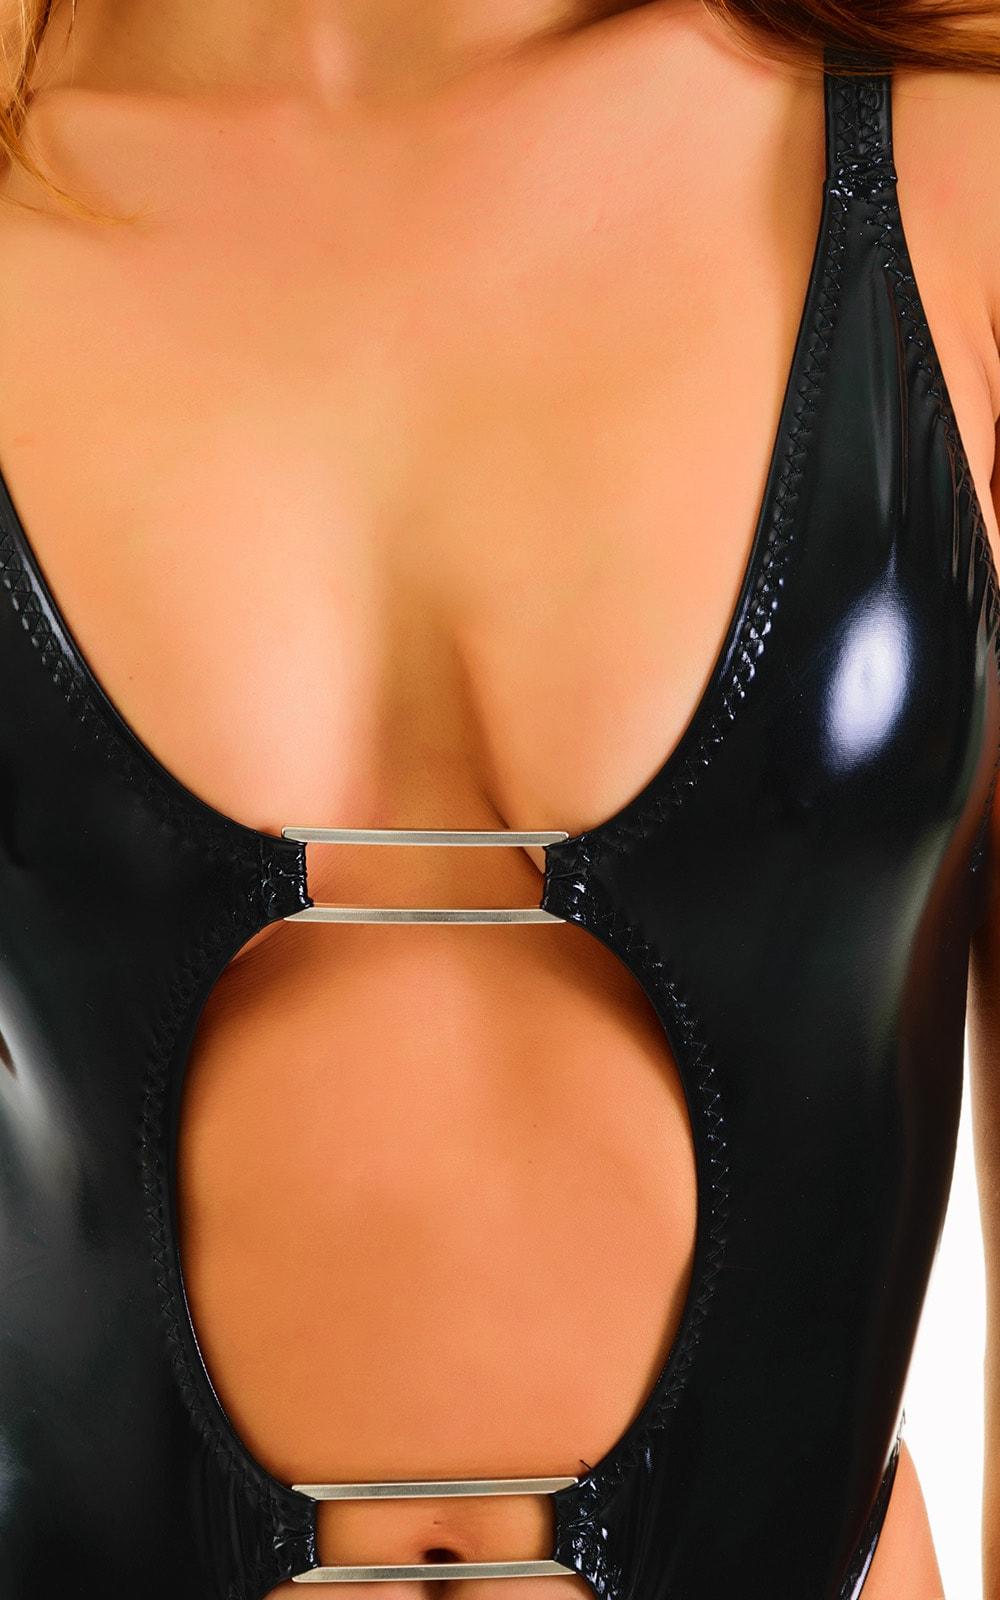 One Piece Keyhole Rio Bikini in Gloss Black Stretch vinyl/nylon/lycra 3